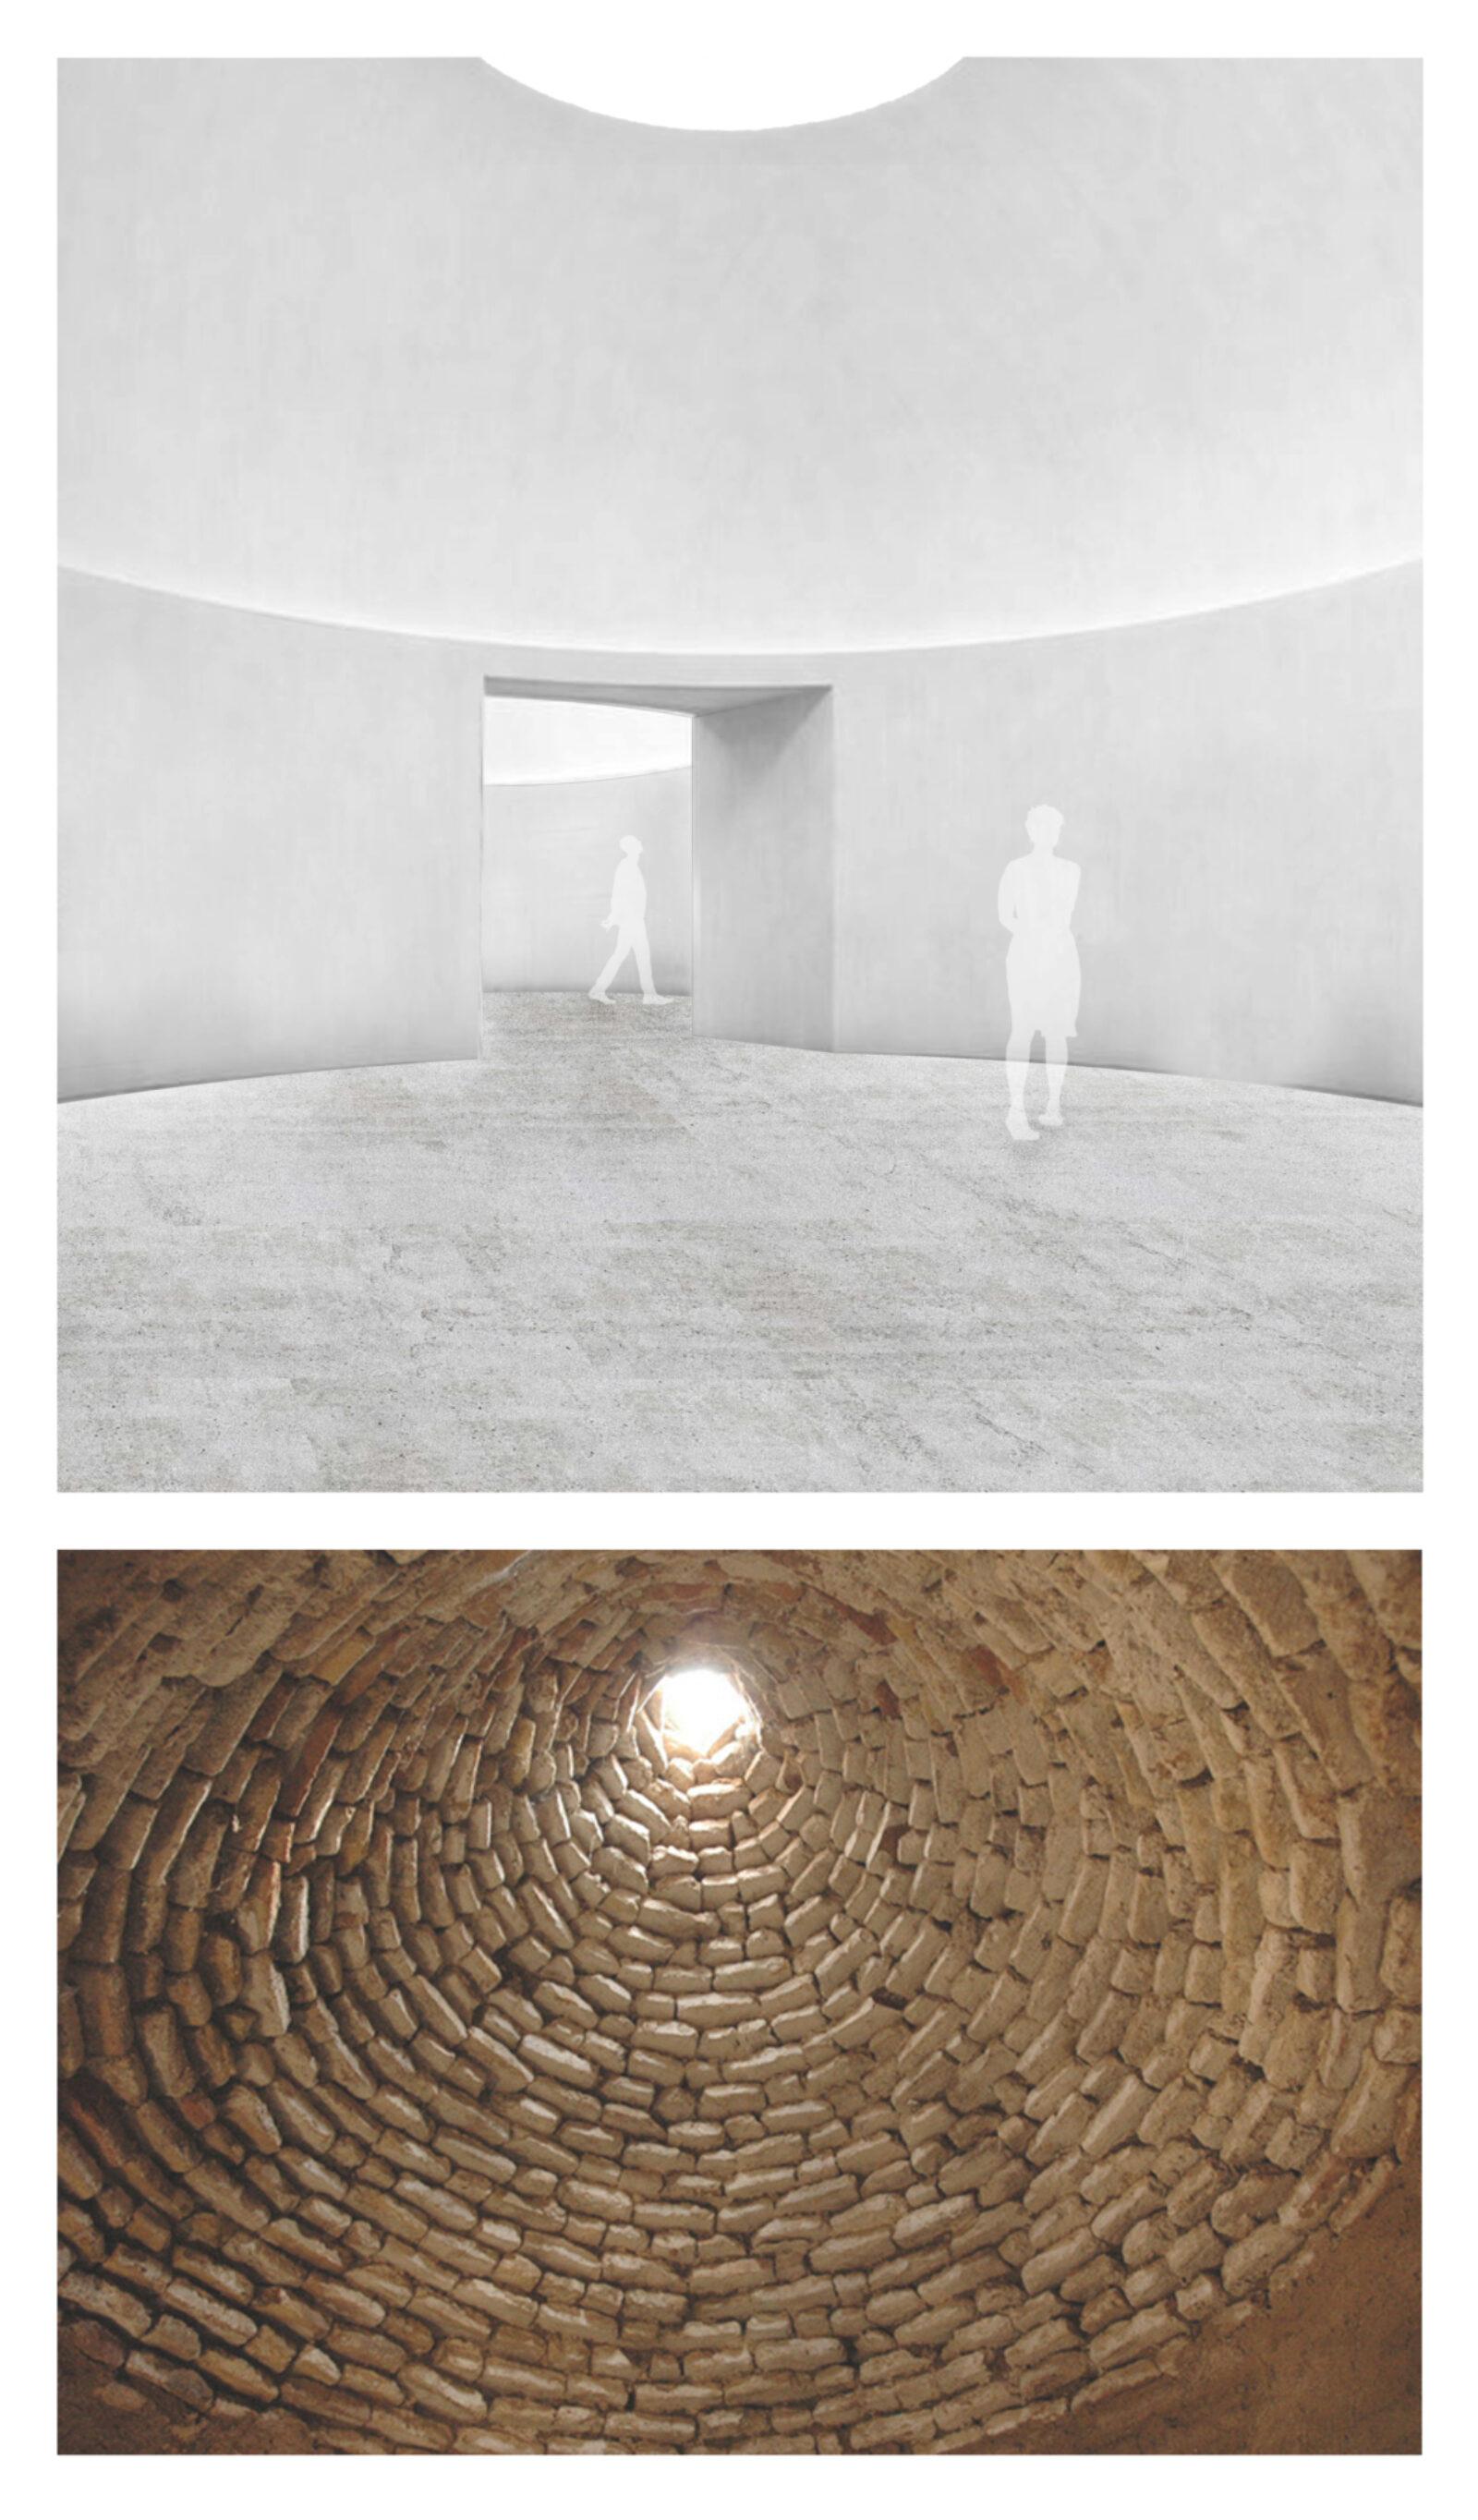 Internal Concept Views